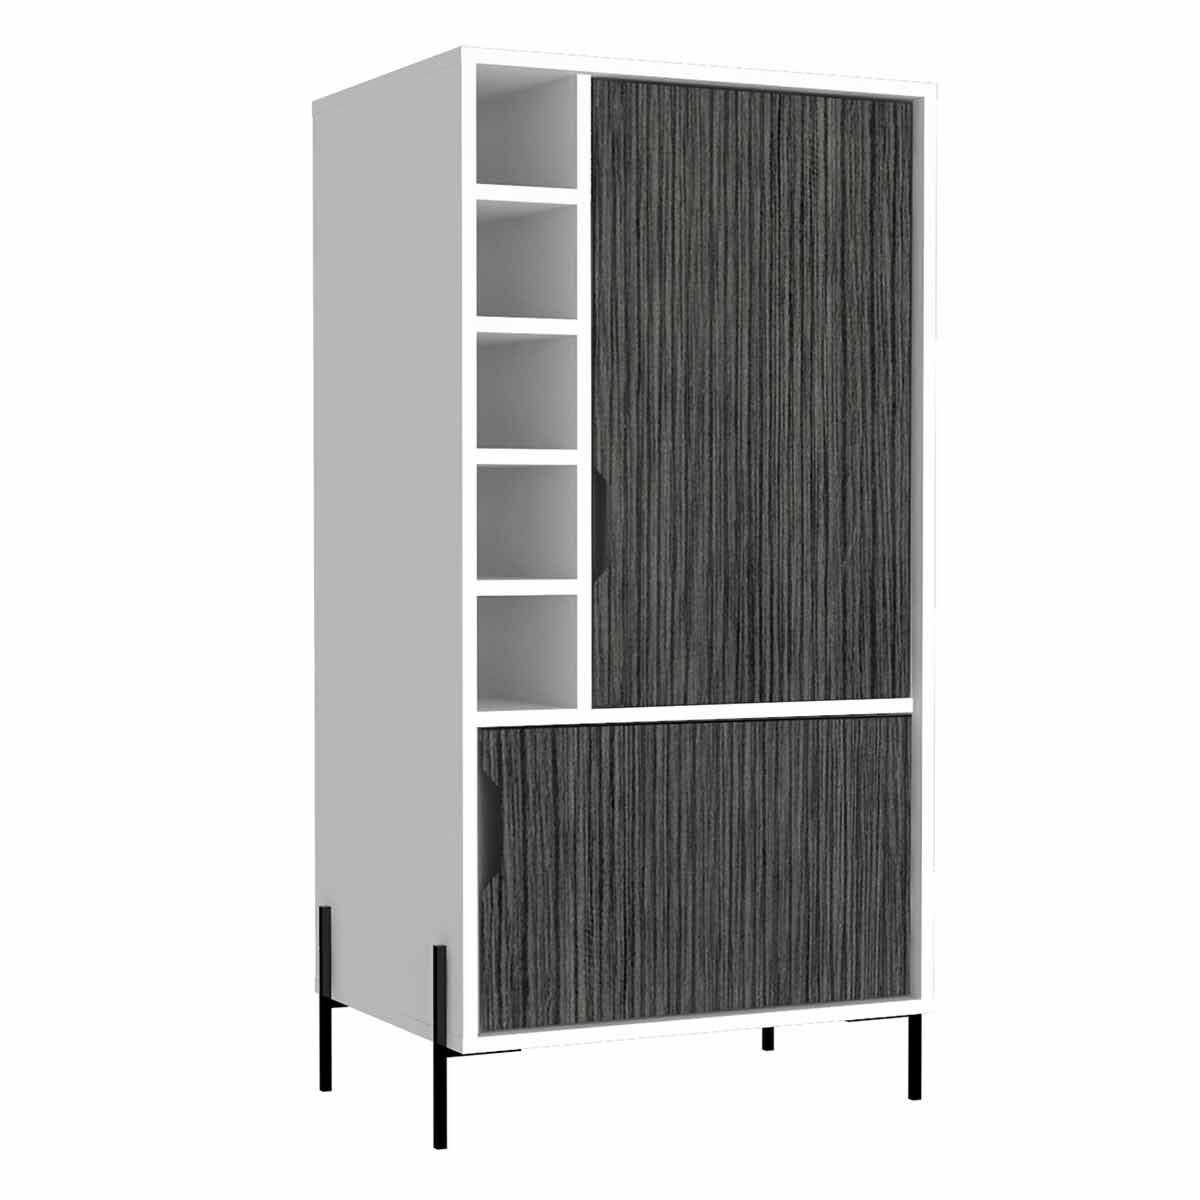 Dallas Two Tone Medium Bar Cabinet